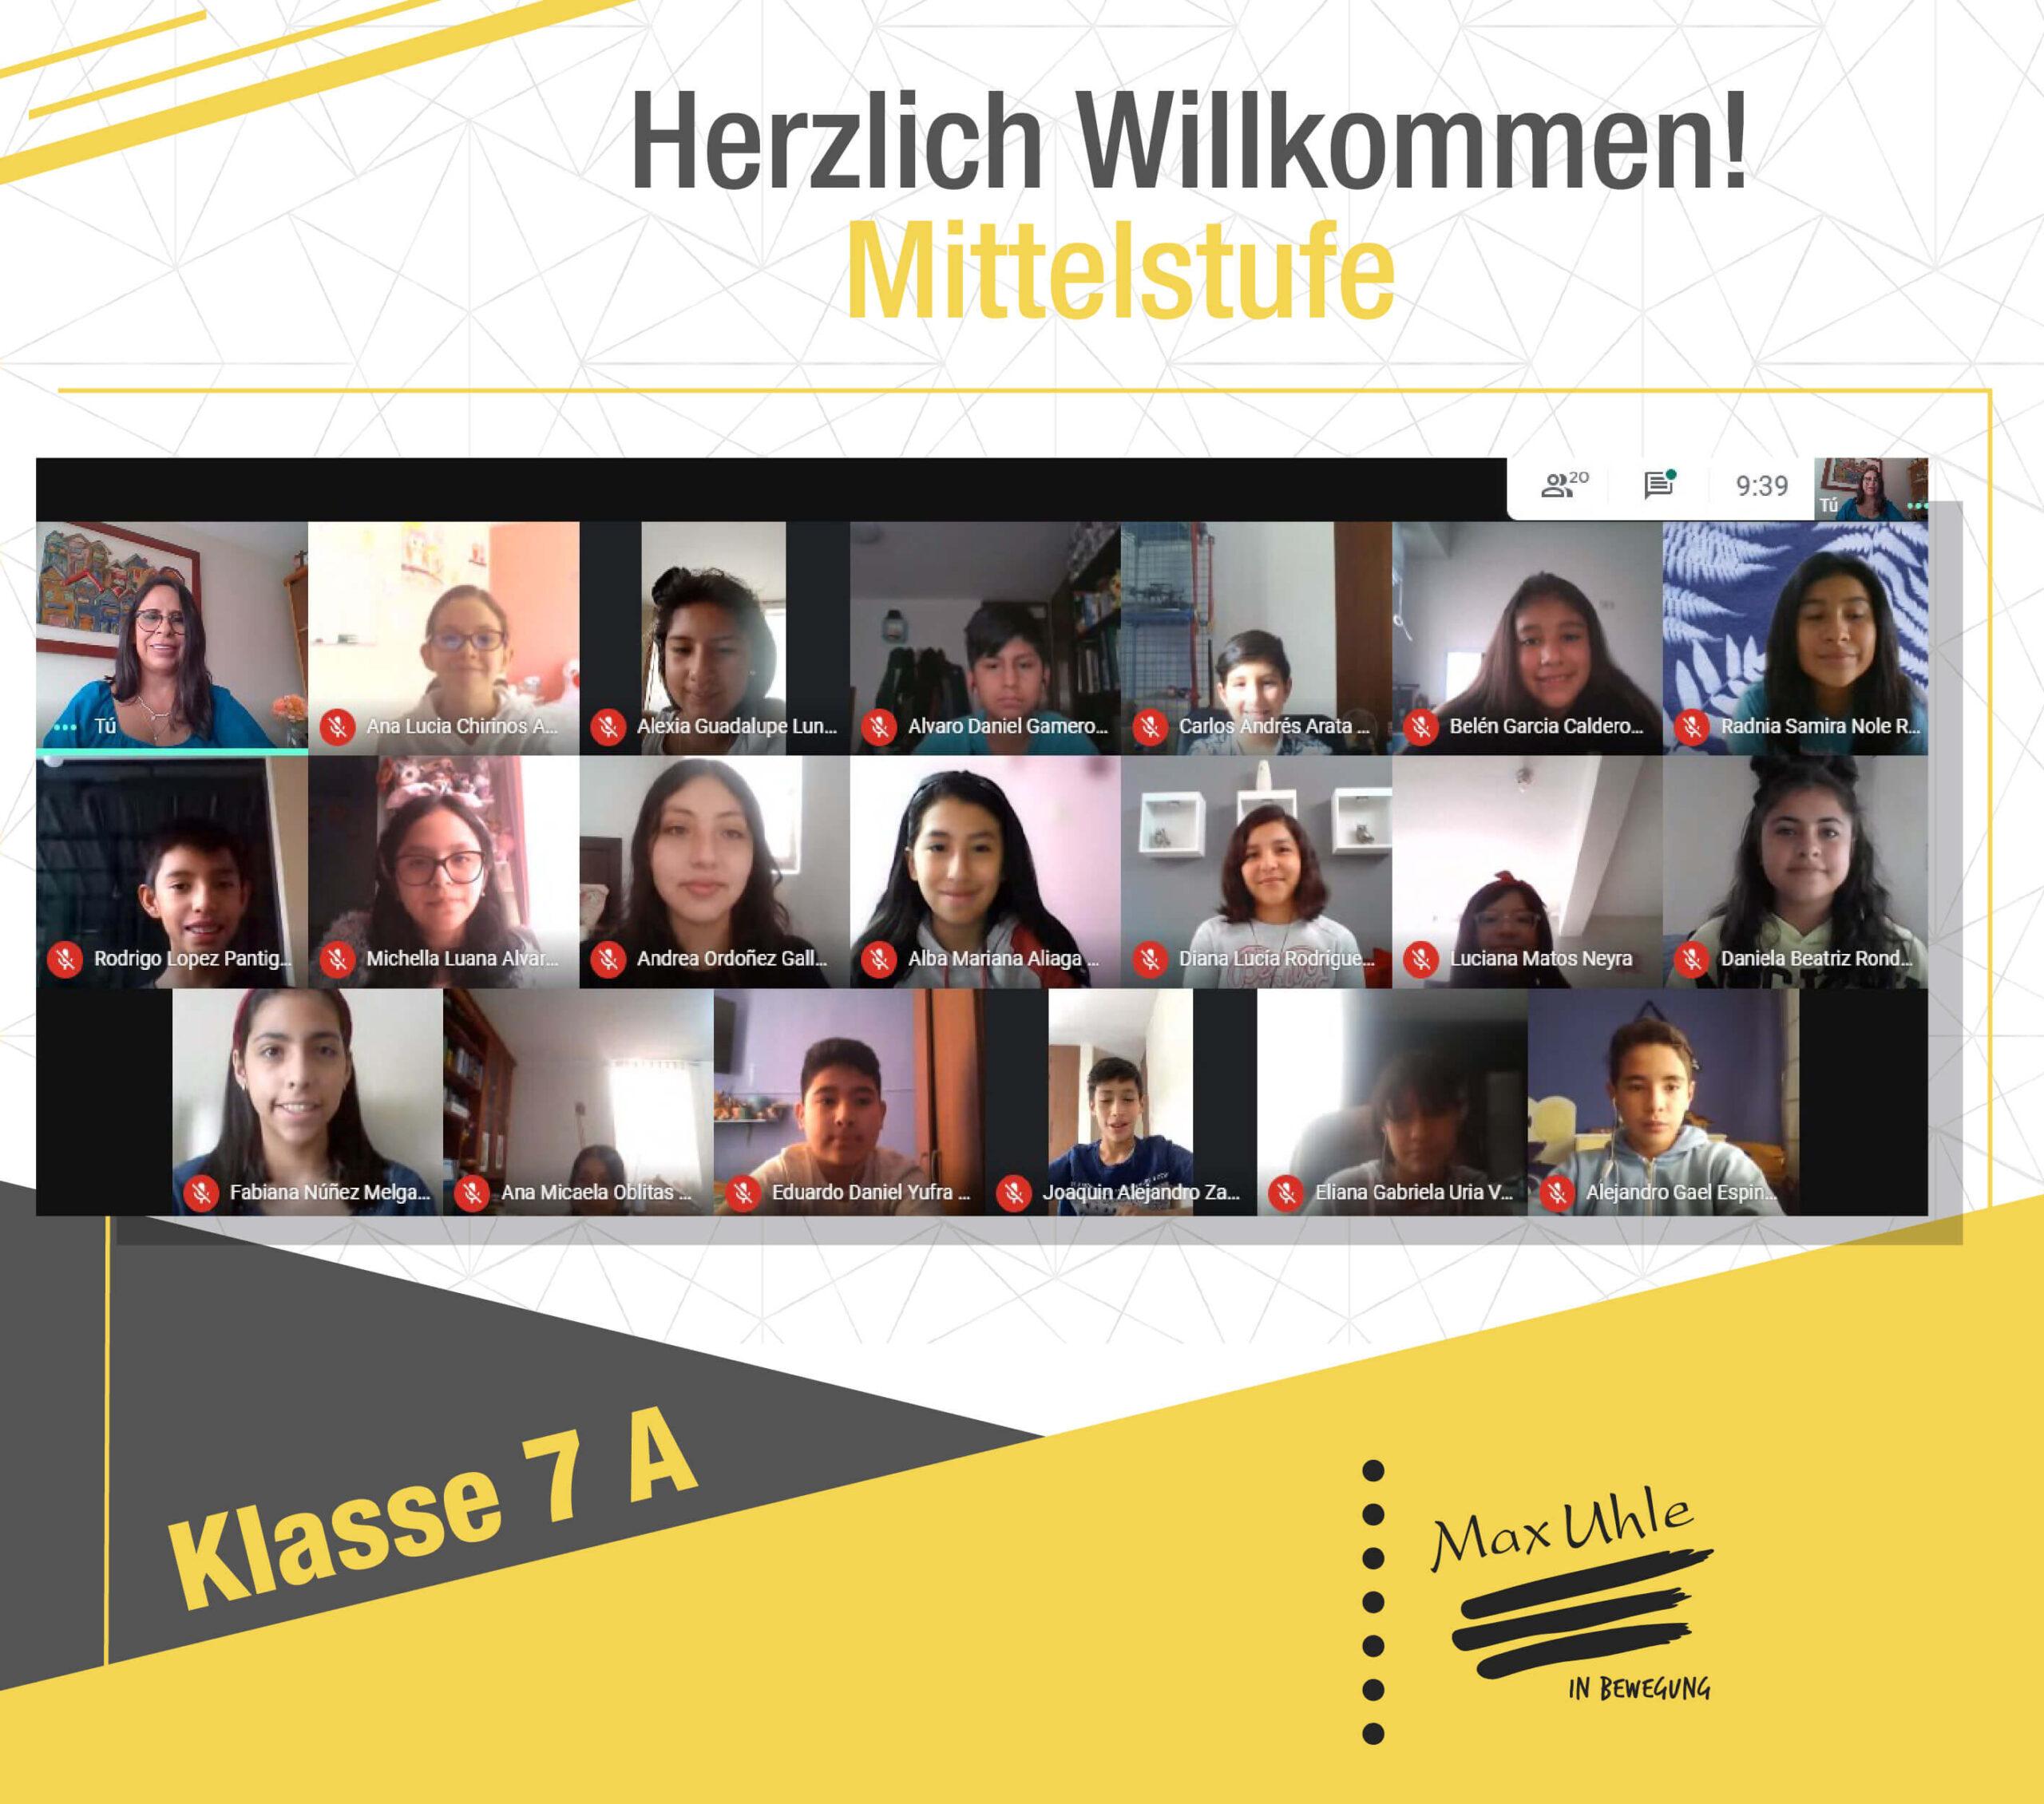 regreso a clases 2021 Mittelstufe 7A